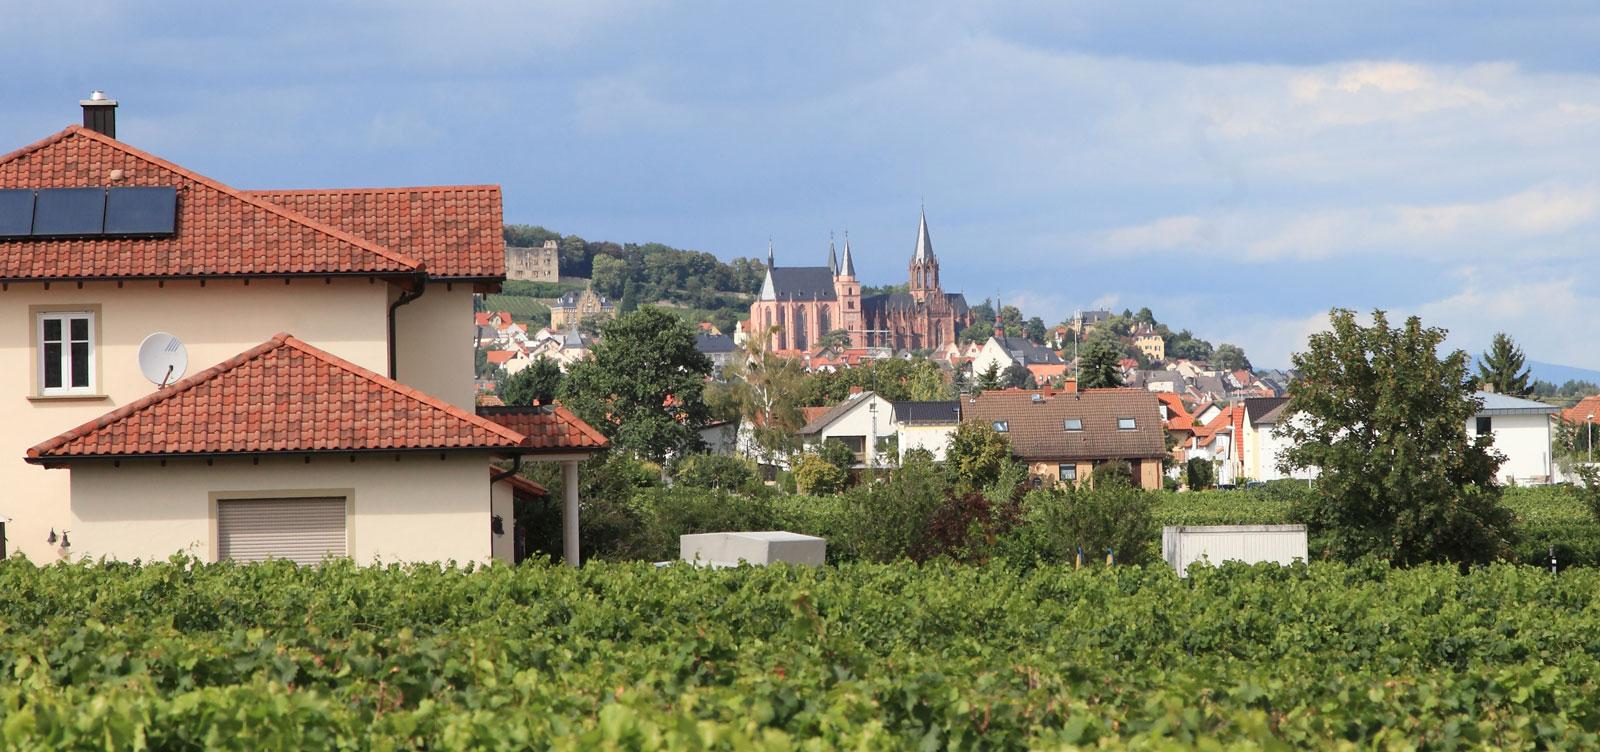 Rhine-14-08-14_18-04-59